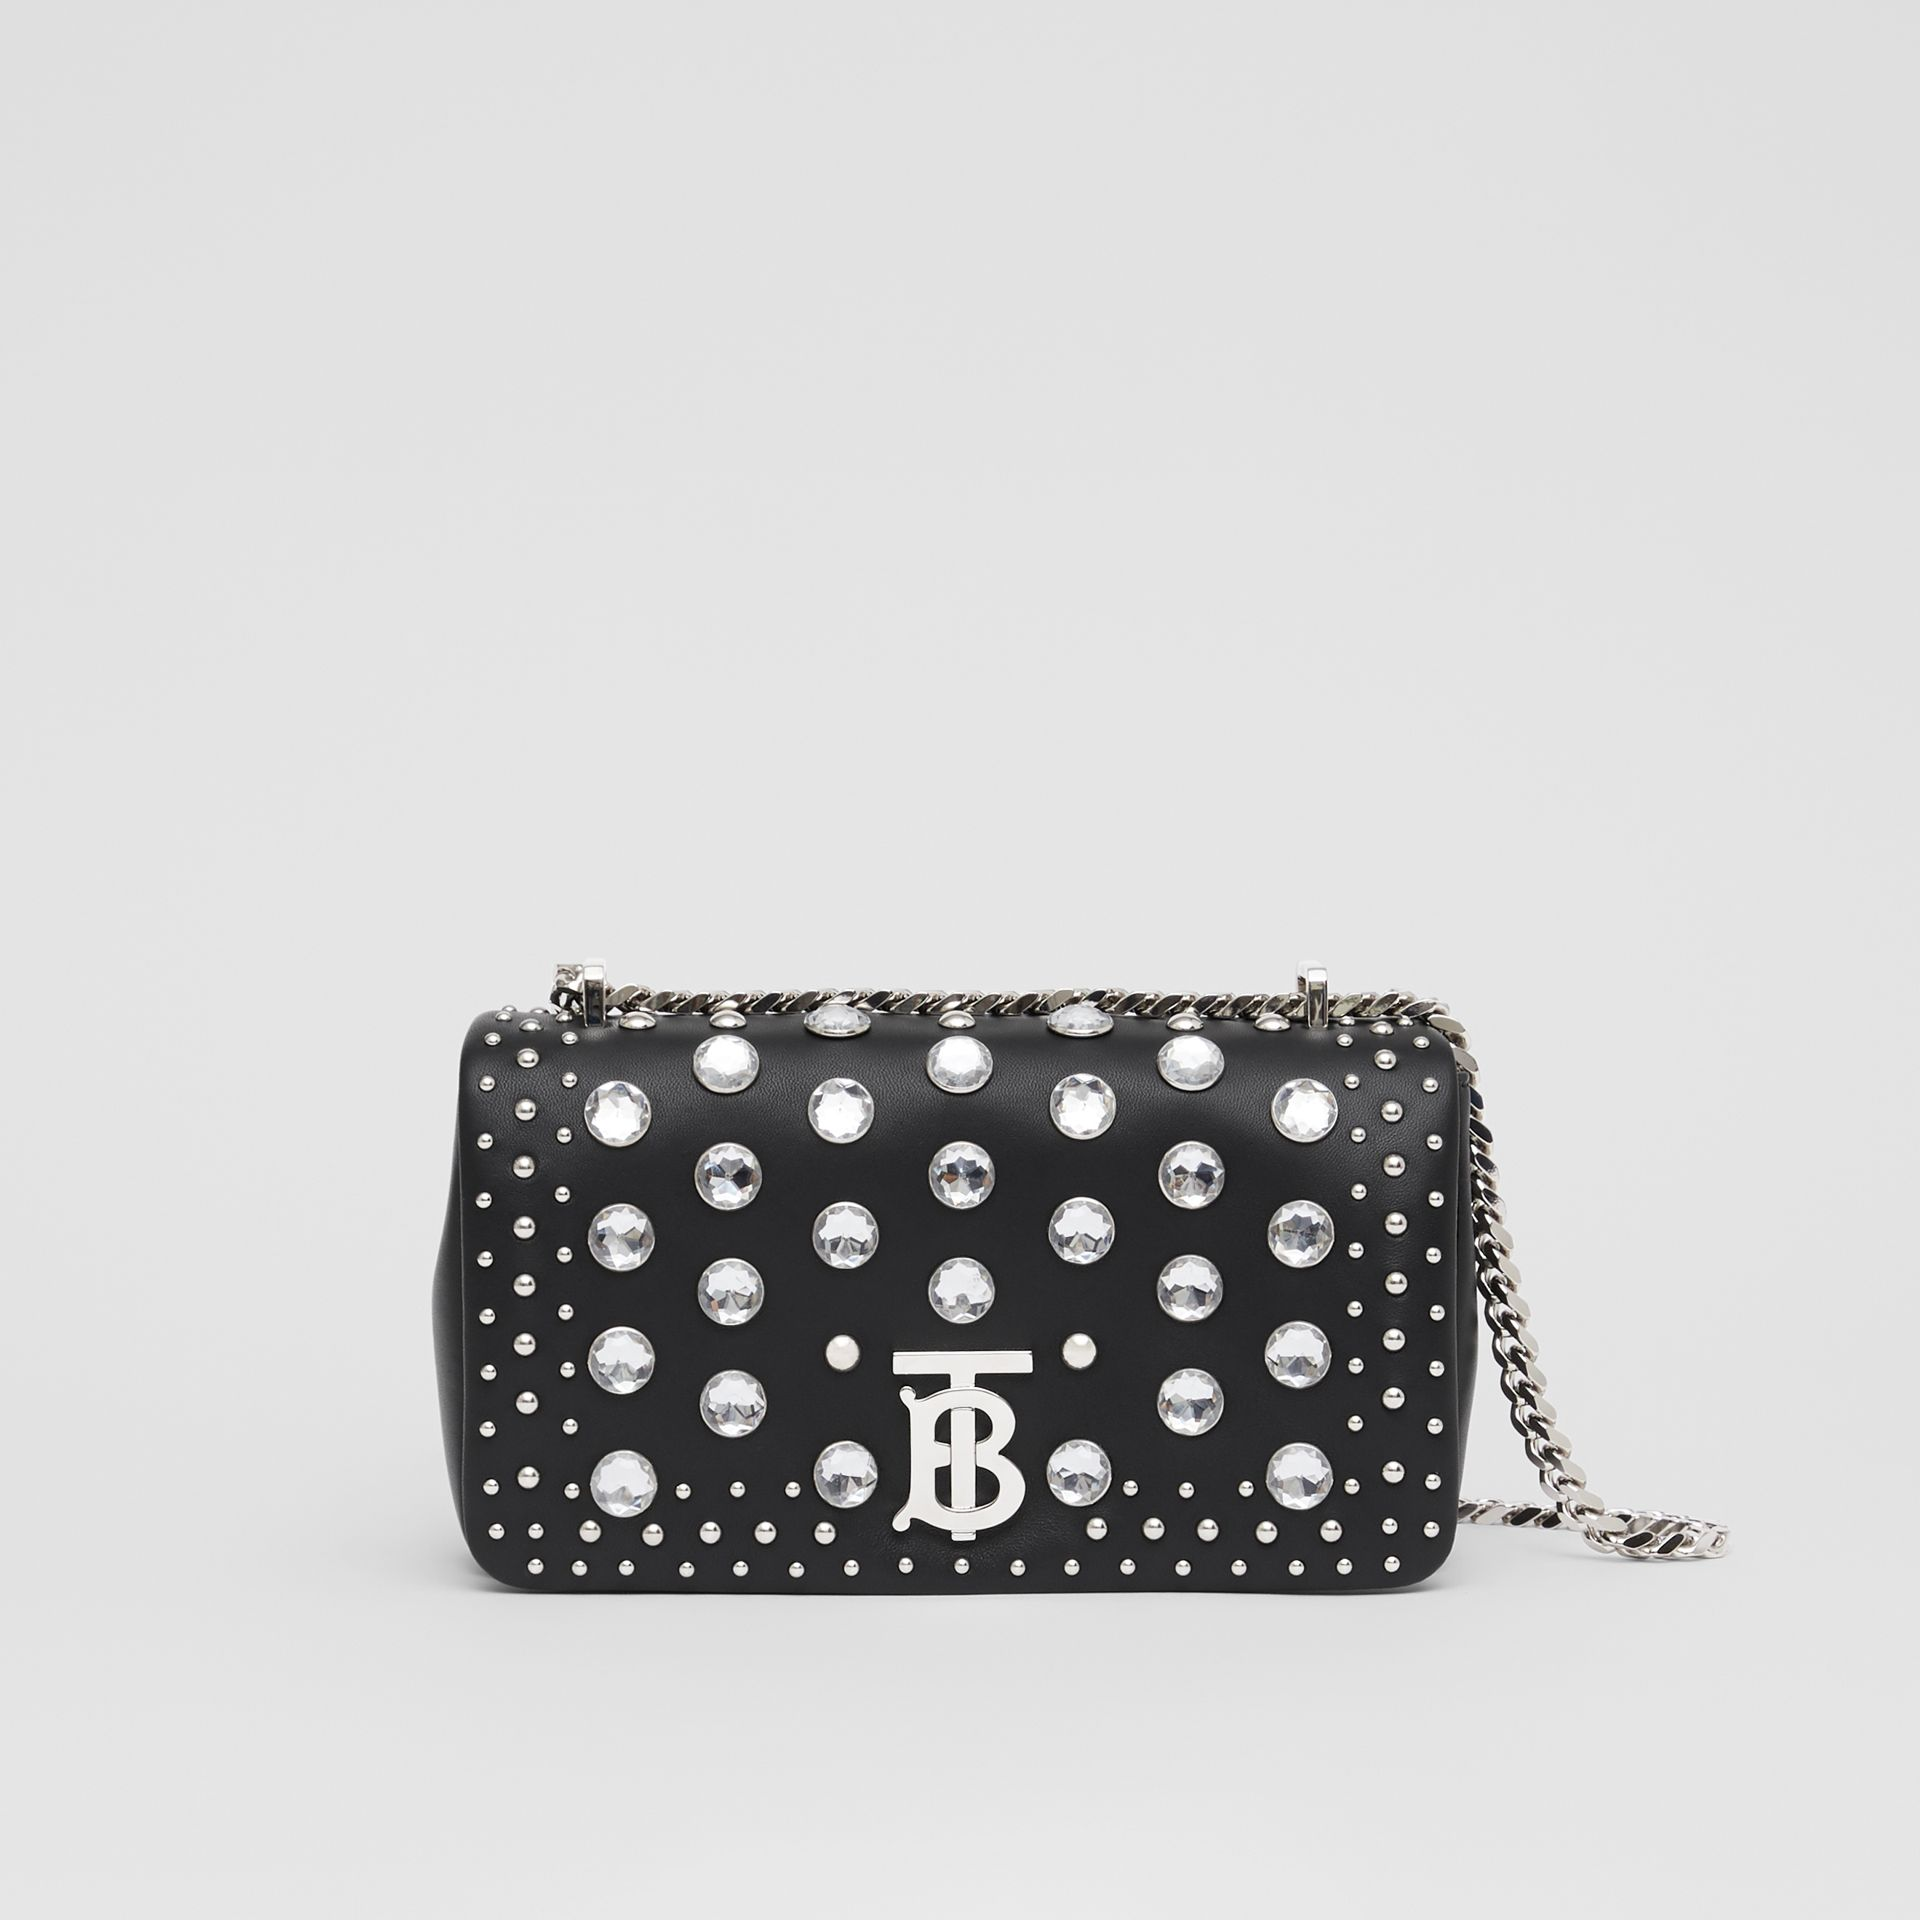 Small Embellished Lambskin Lola Bag in Black - Women | Burberry - gallery image 0